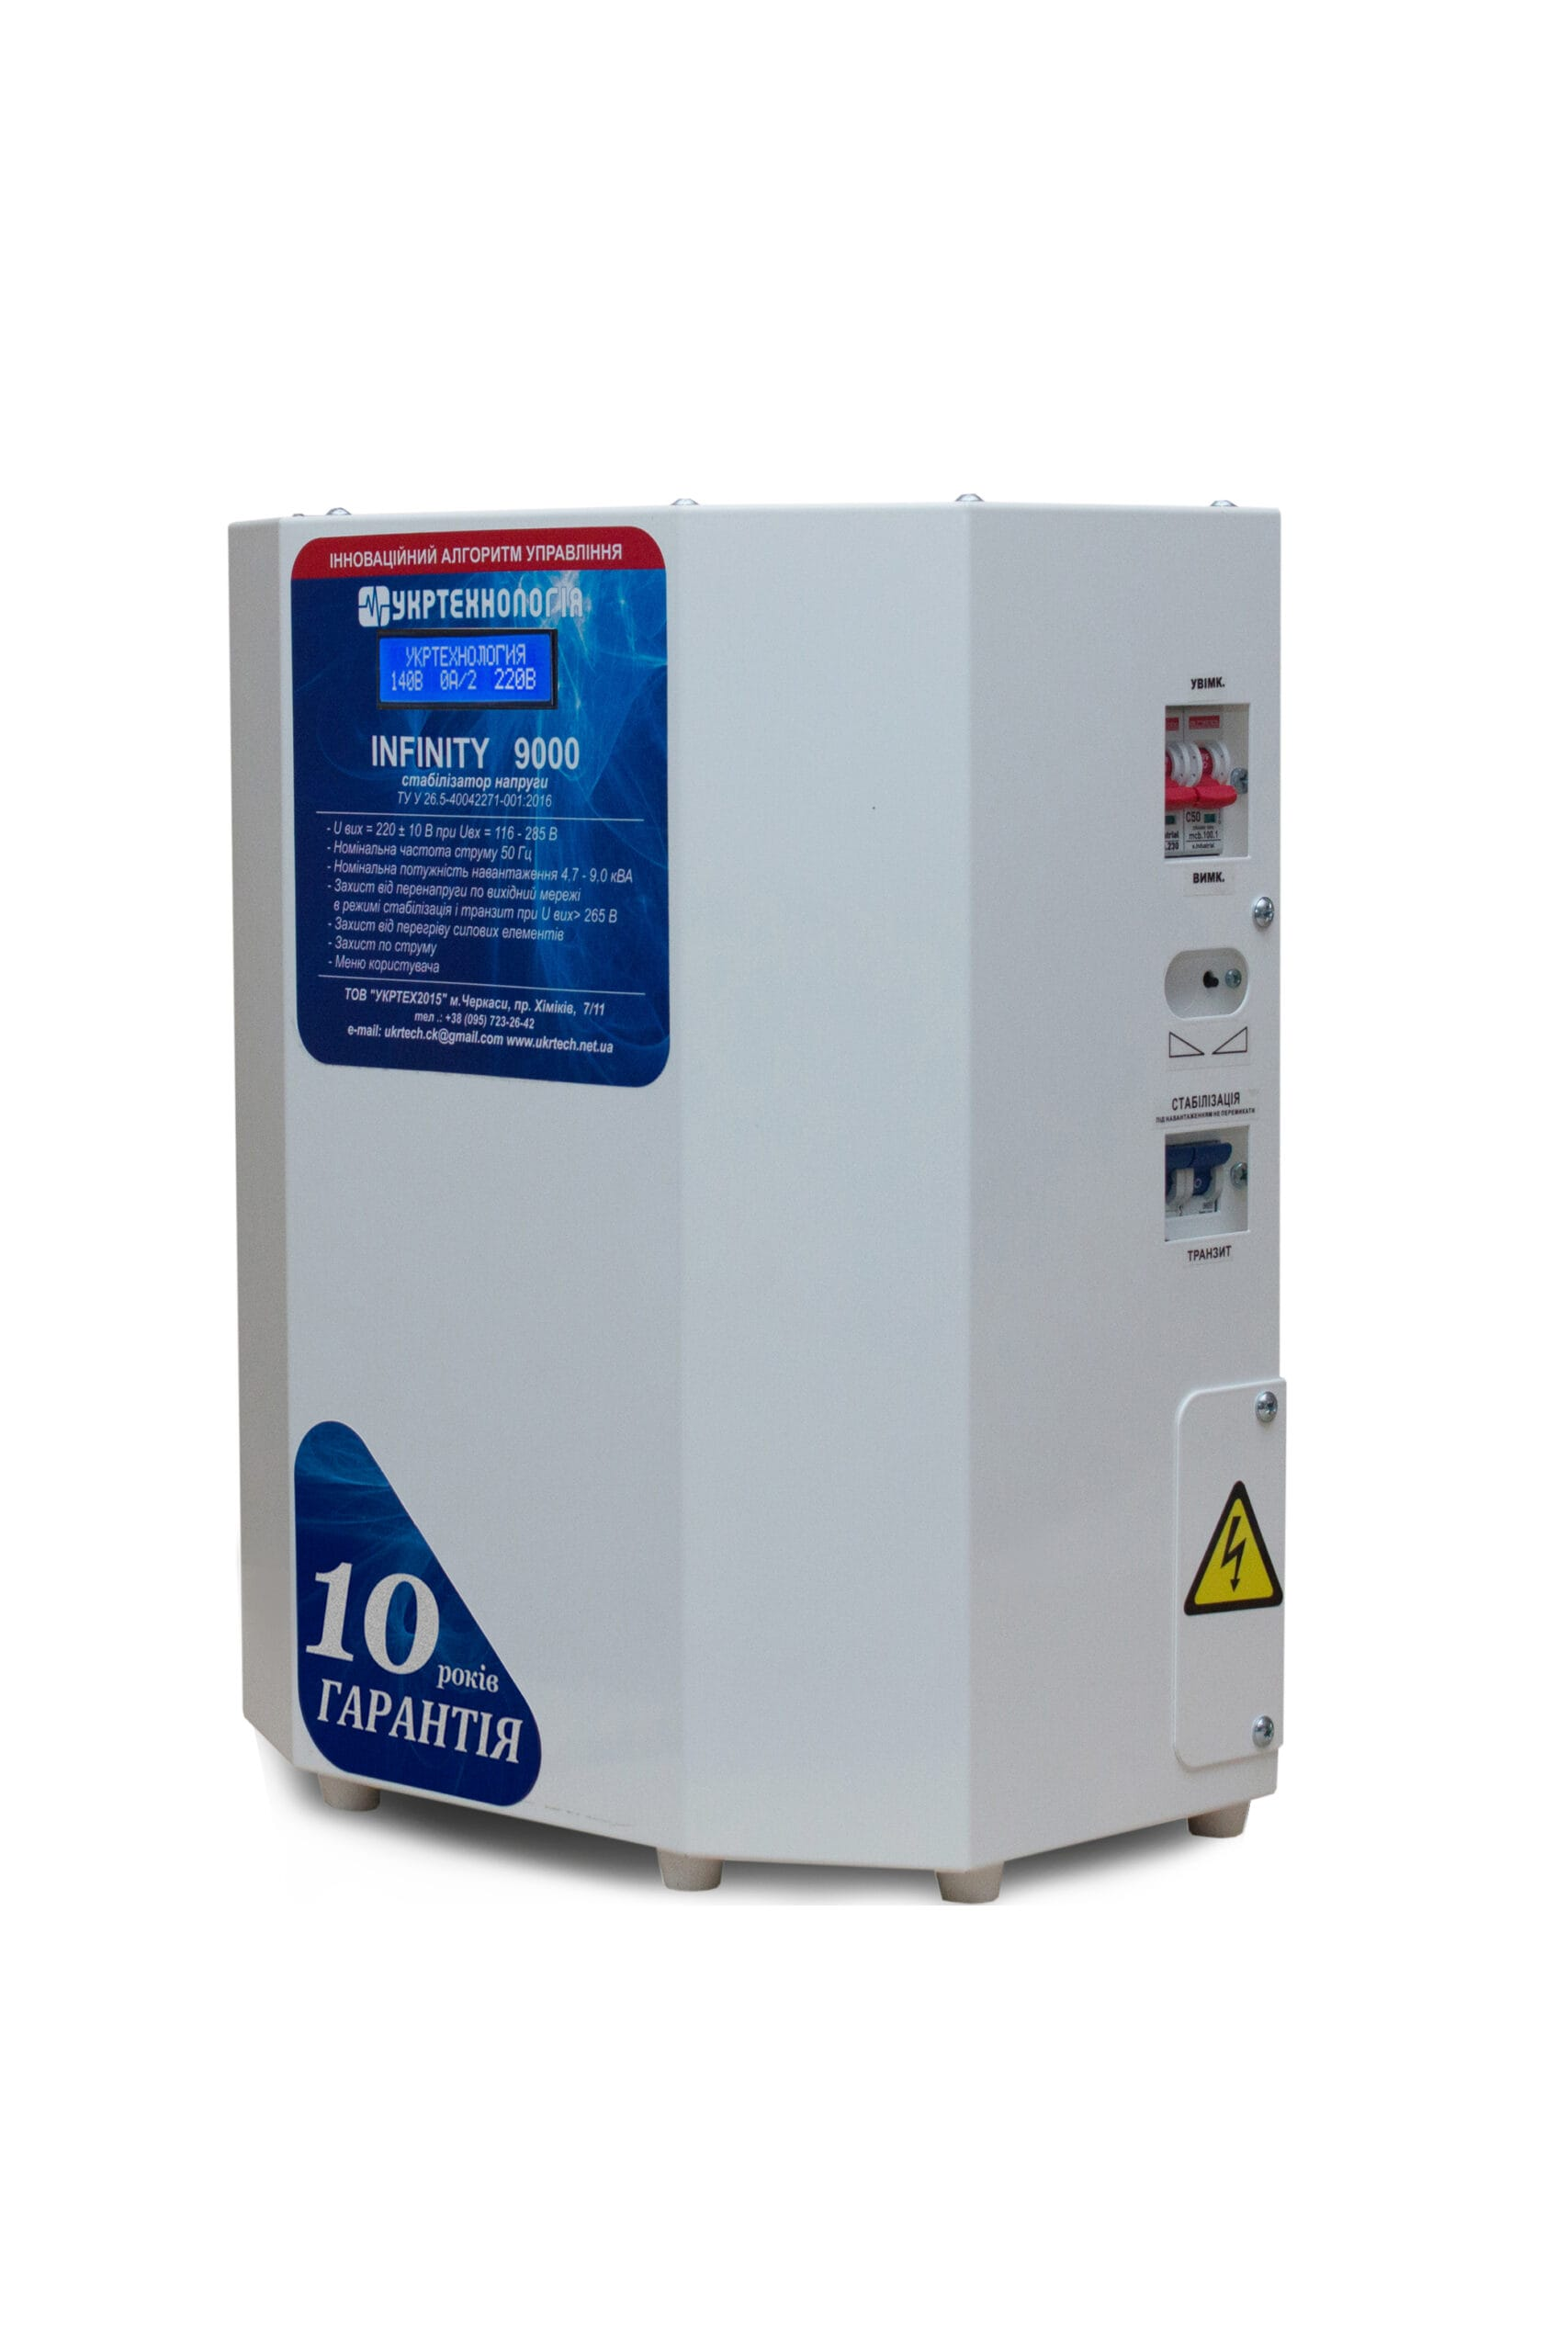 Стабилизаторы напряжения - Стабилизатор напряжения 9 кВт INFINITY 000001412 - Фото 1